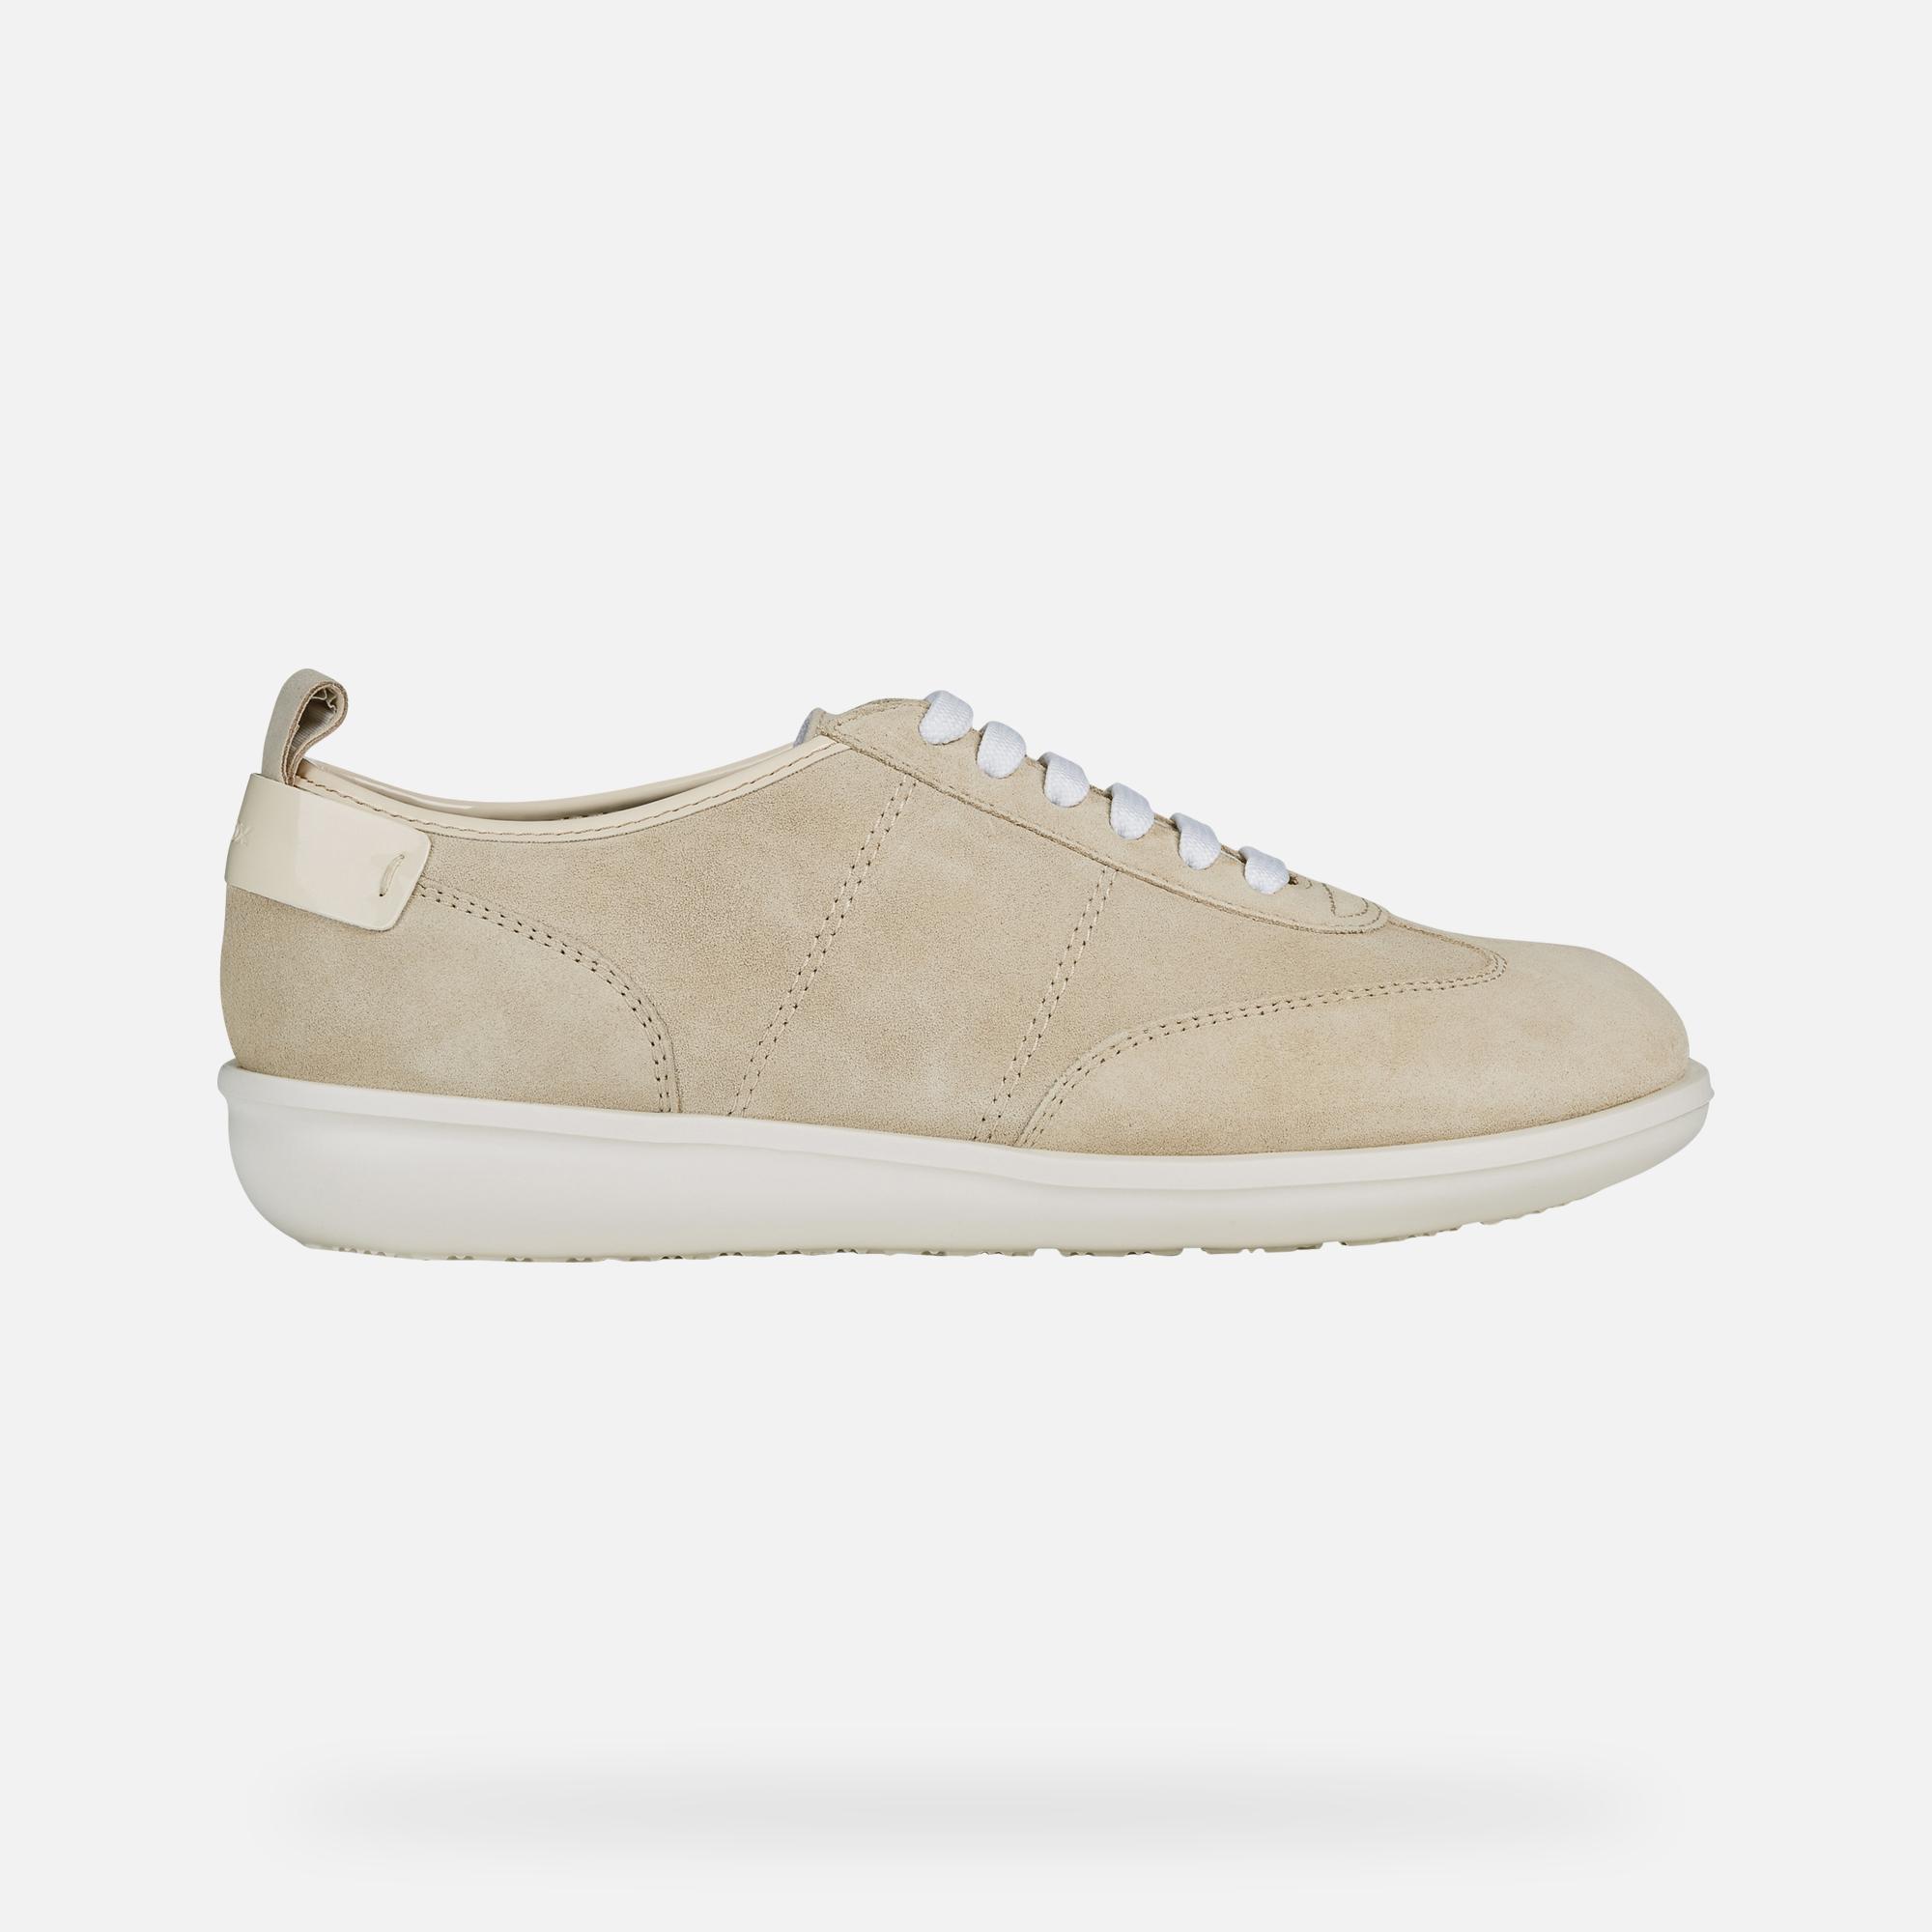 chaussure jearl geox